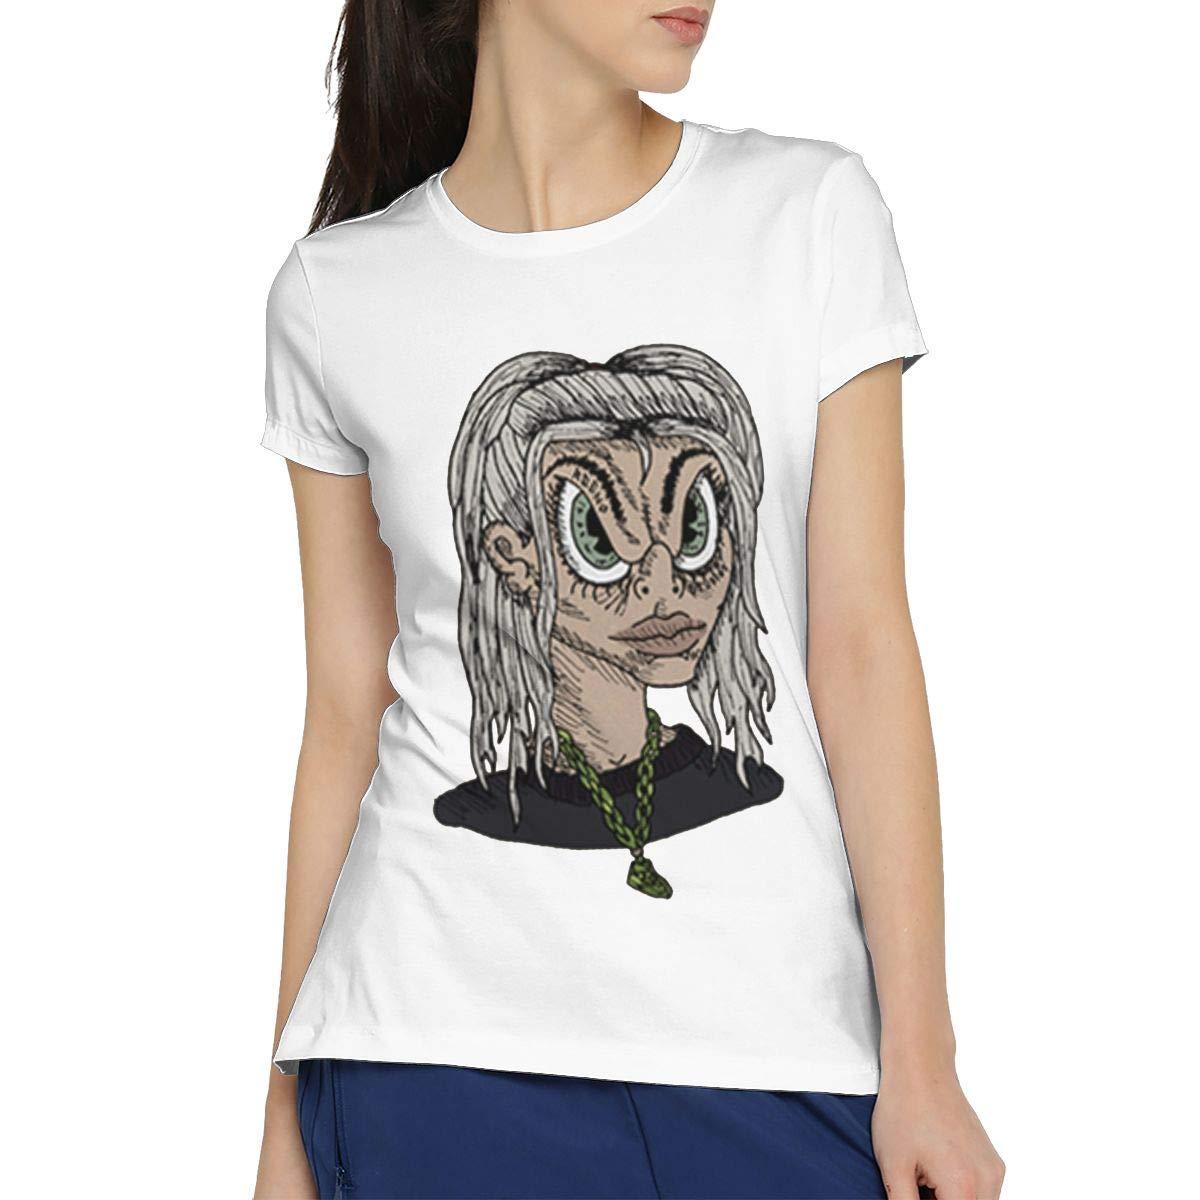 Clann Billie Eilish Cartoon Singer Short Sleeve Tshirt Tees